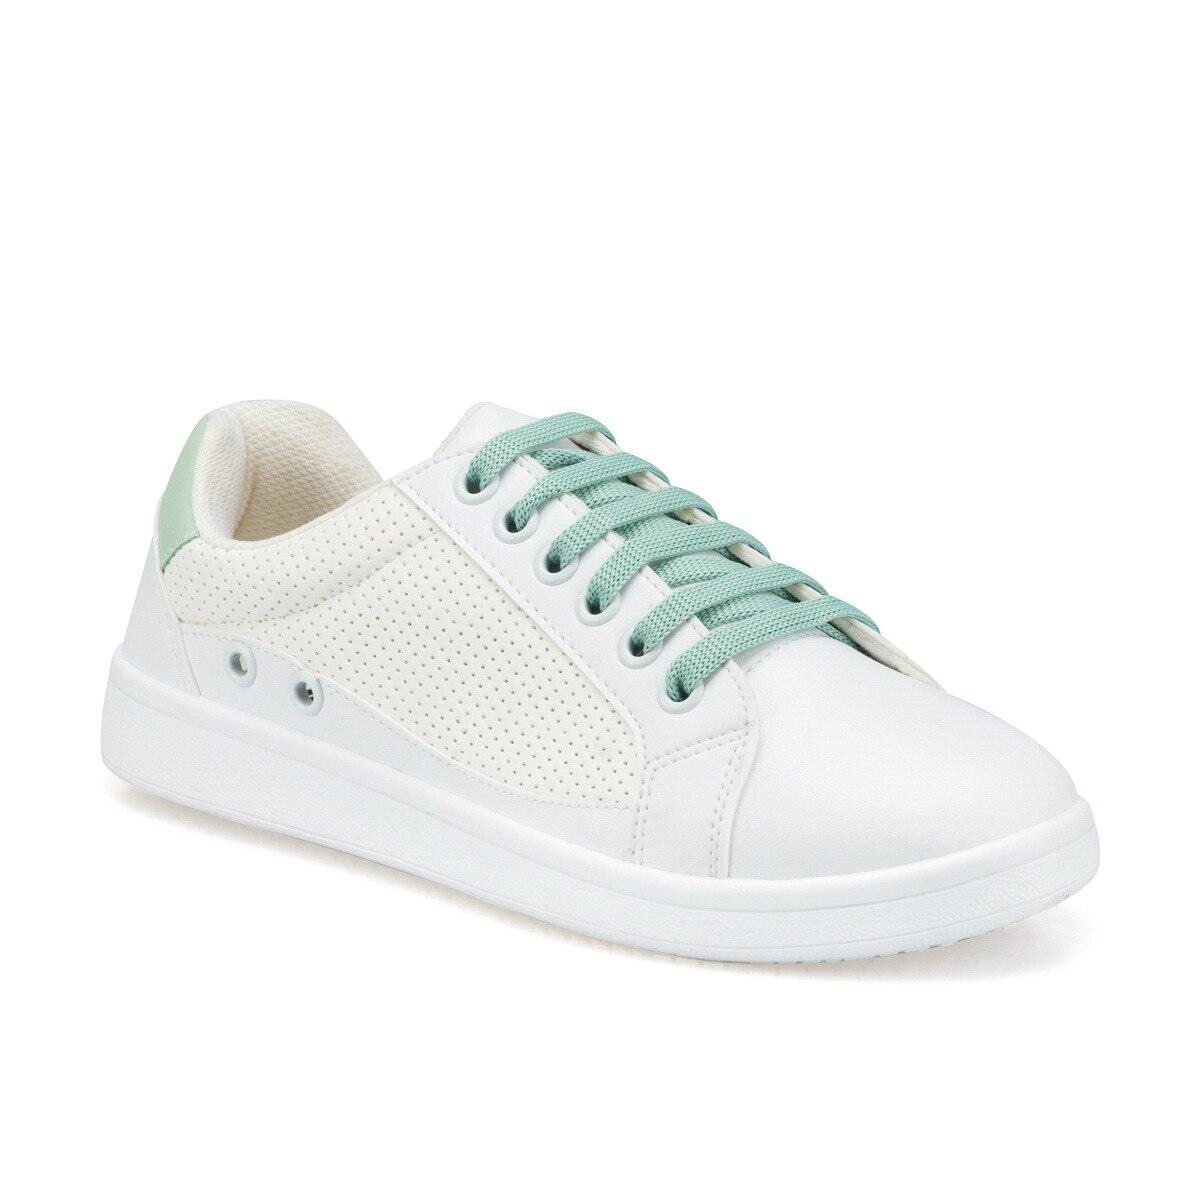 FLO 315601.Z Mint Women 'S Sneaker Shoes Polaris